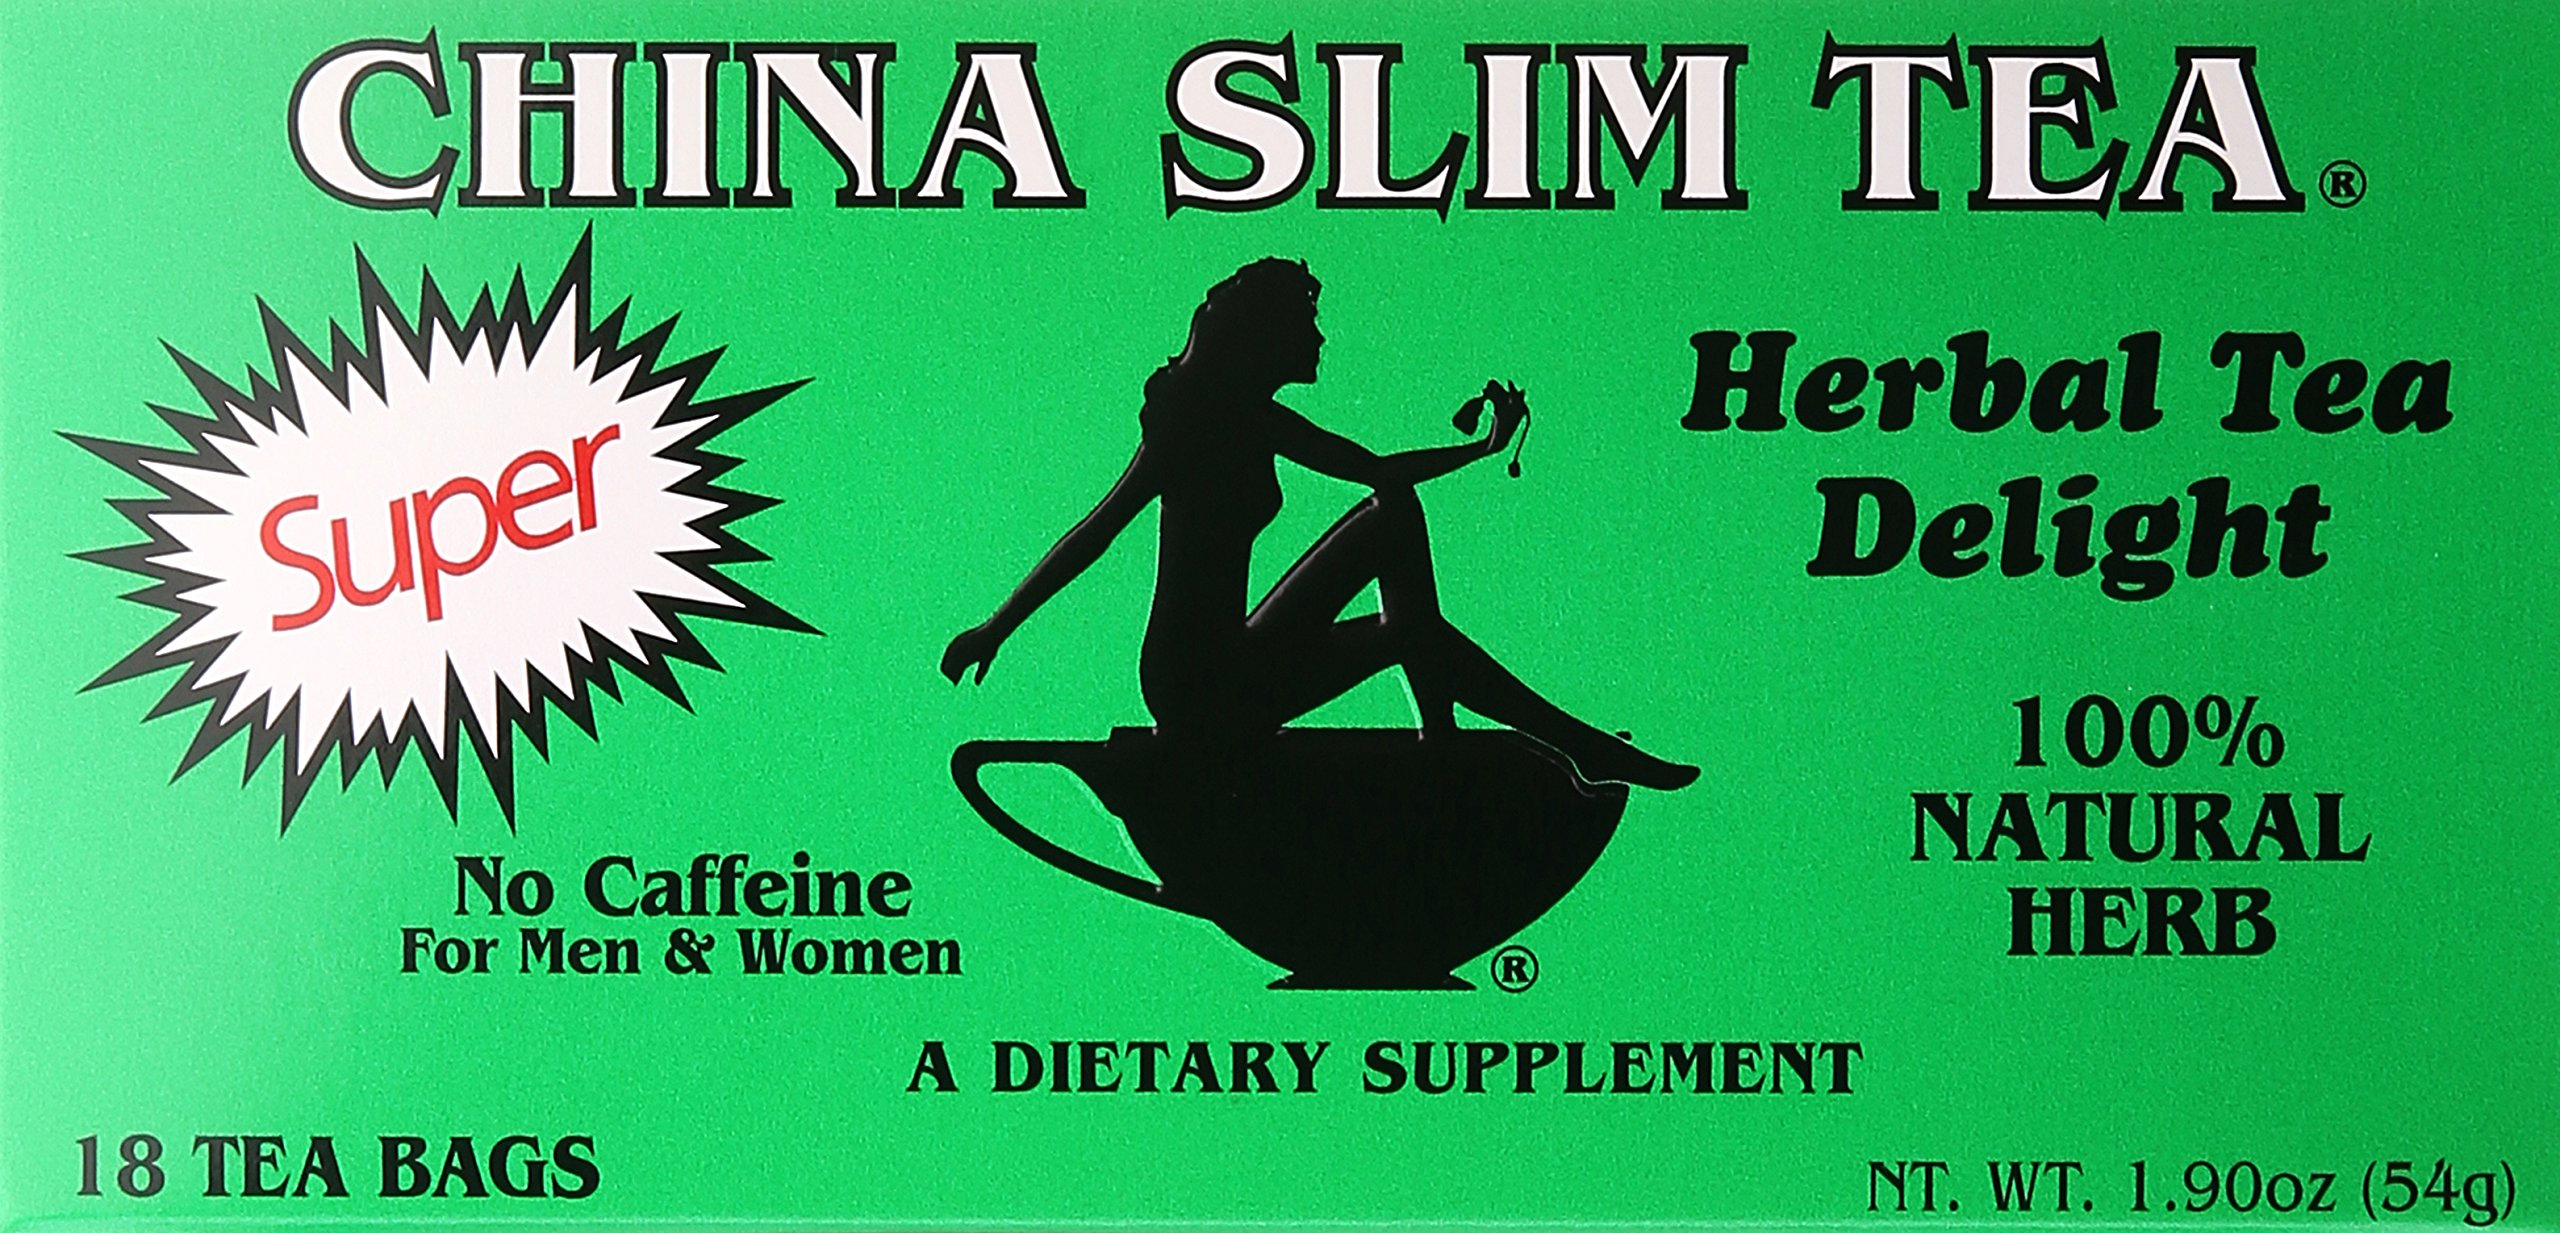 China Slim Tea